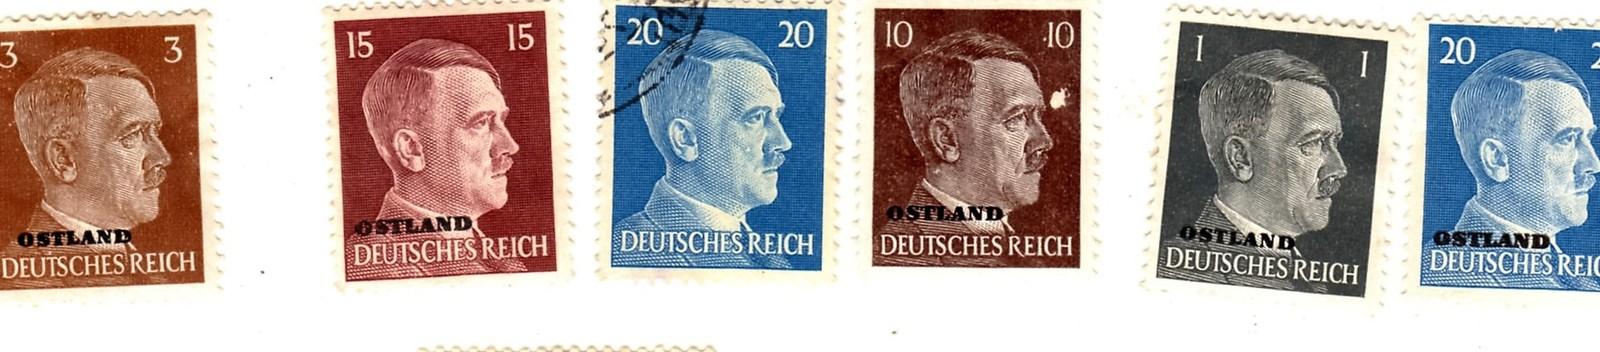 Stamps - Germany- European Postage -Germany (25 vintage stamps) image 4